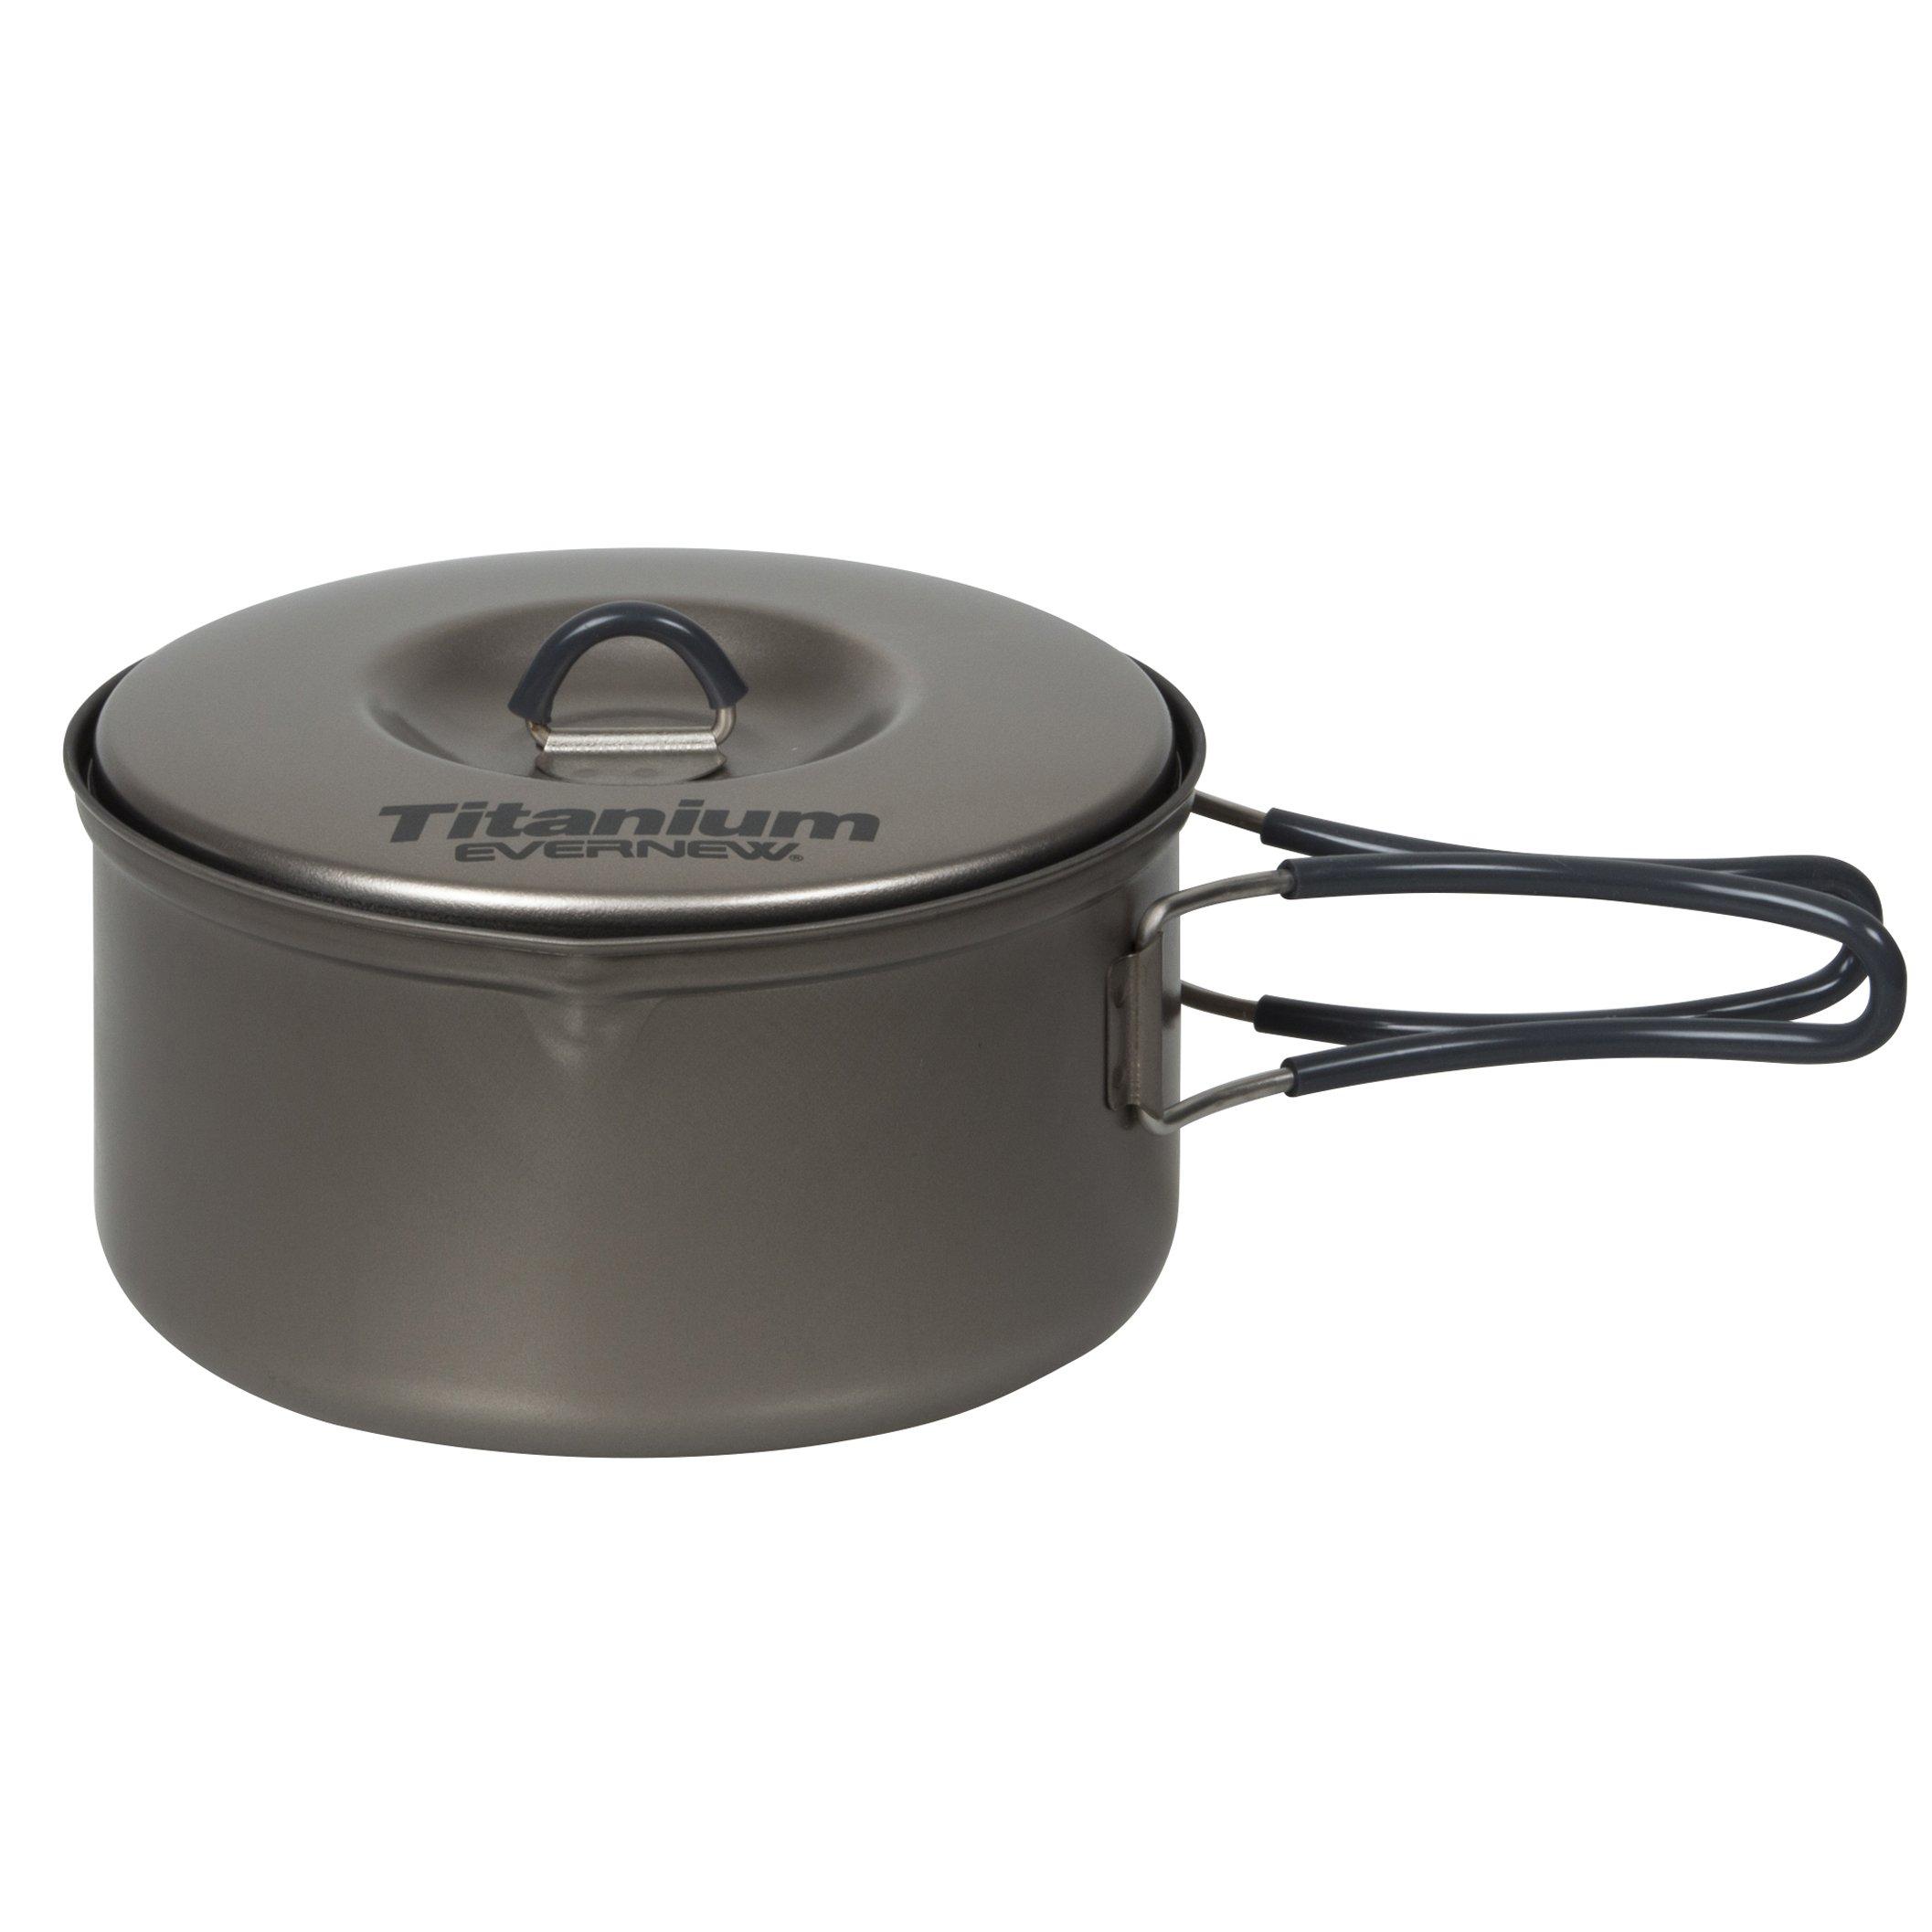 Evernew Titanium Non-Stick Pot, 0.9-Liter by EVERNEW